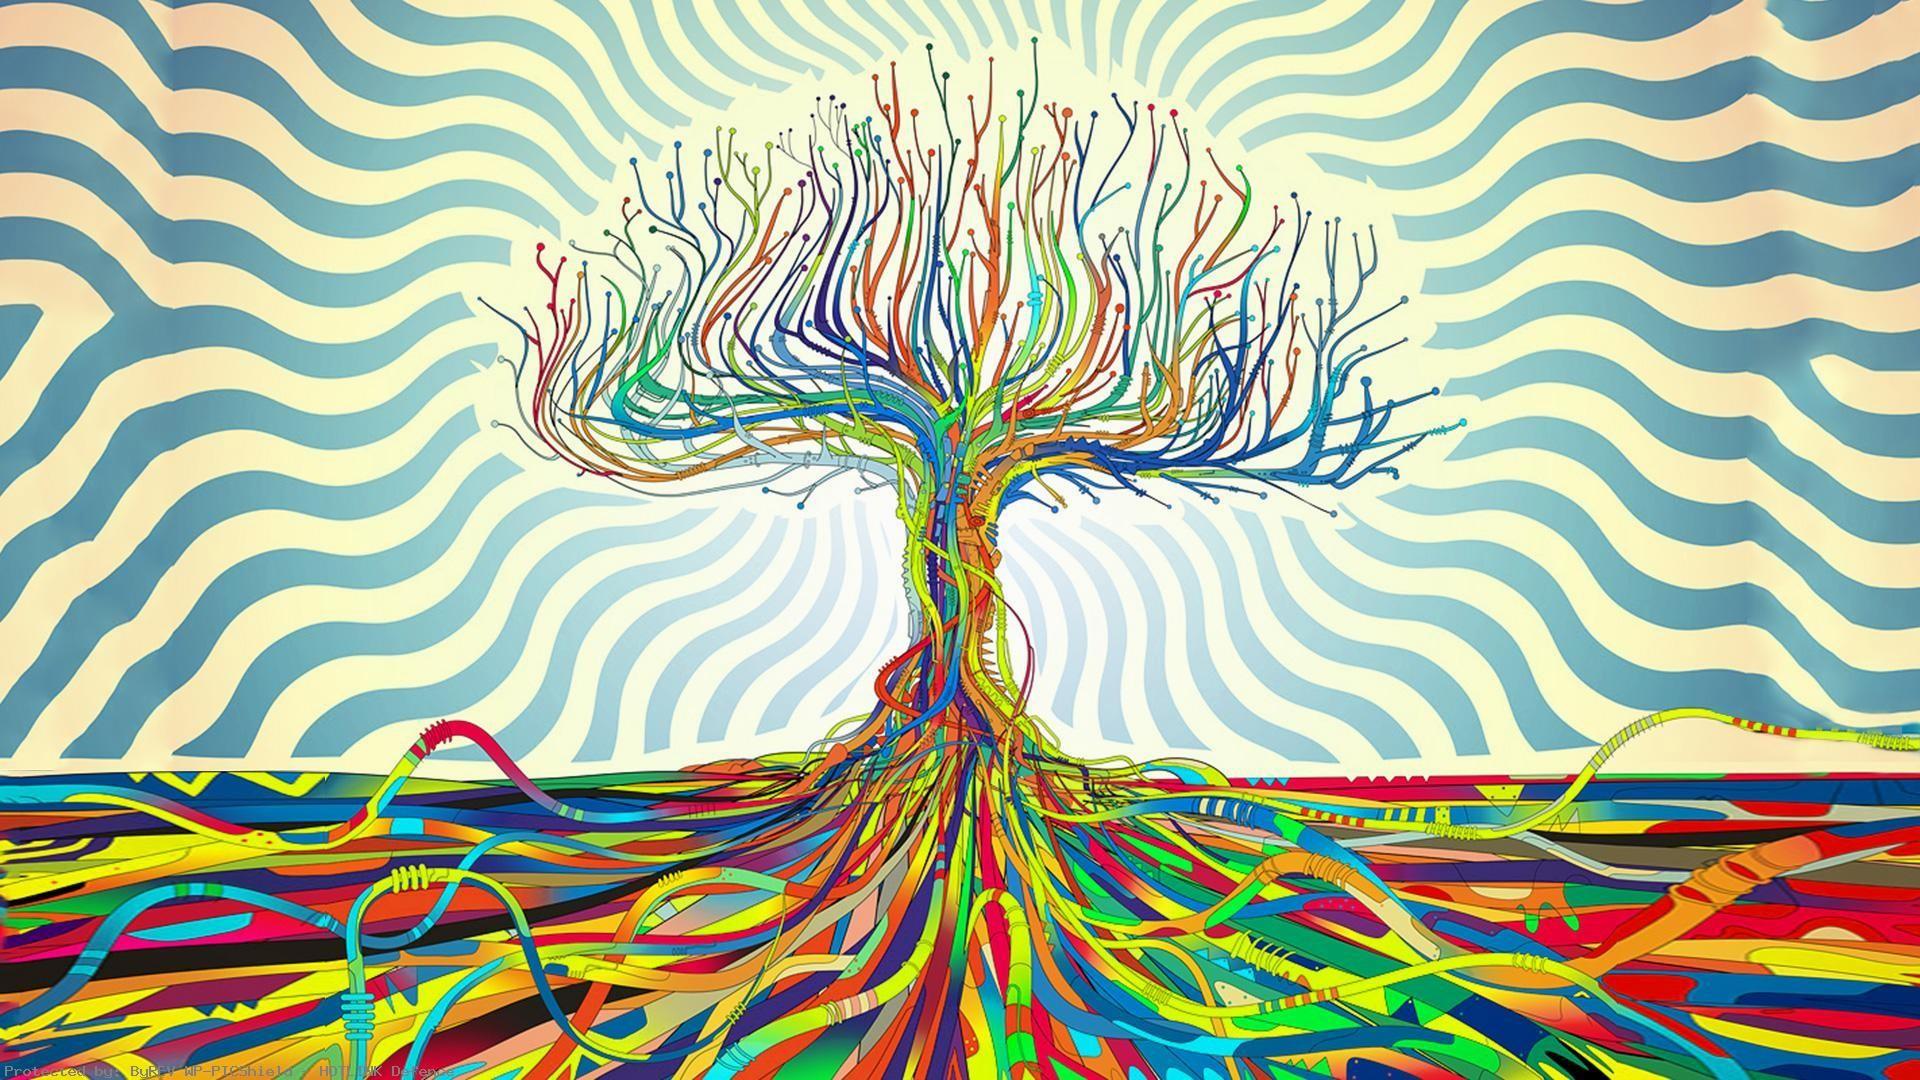 psychedelic-art-psicodelia-psicodelico-fundos-de-tela-arte-